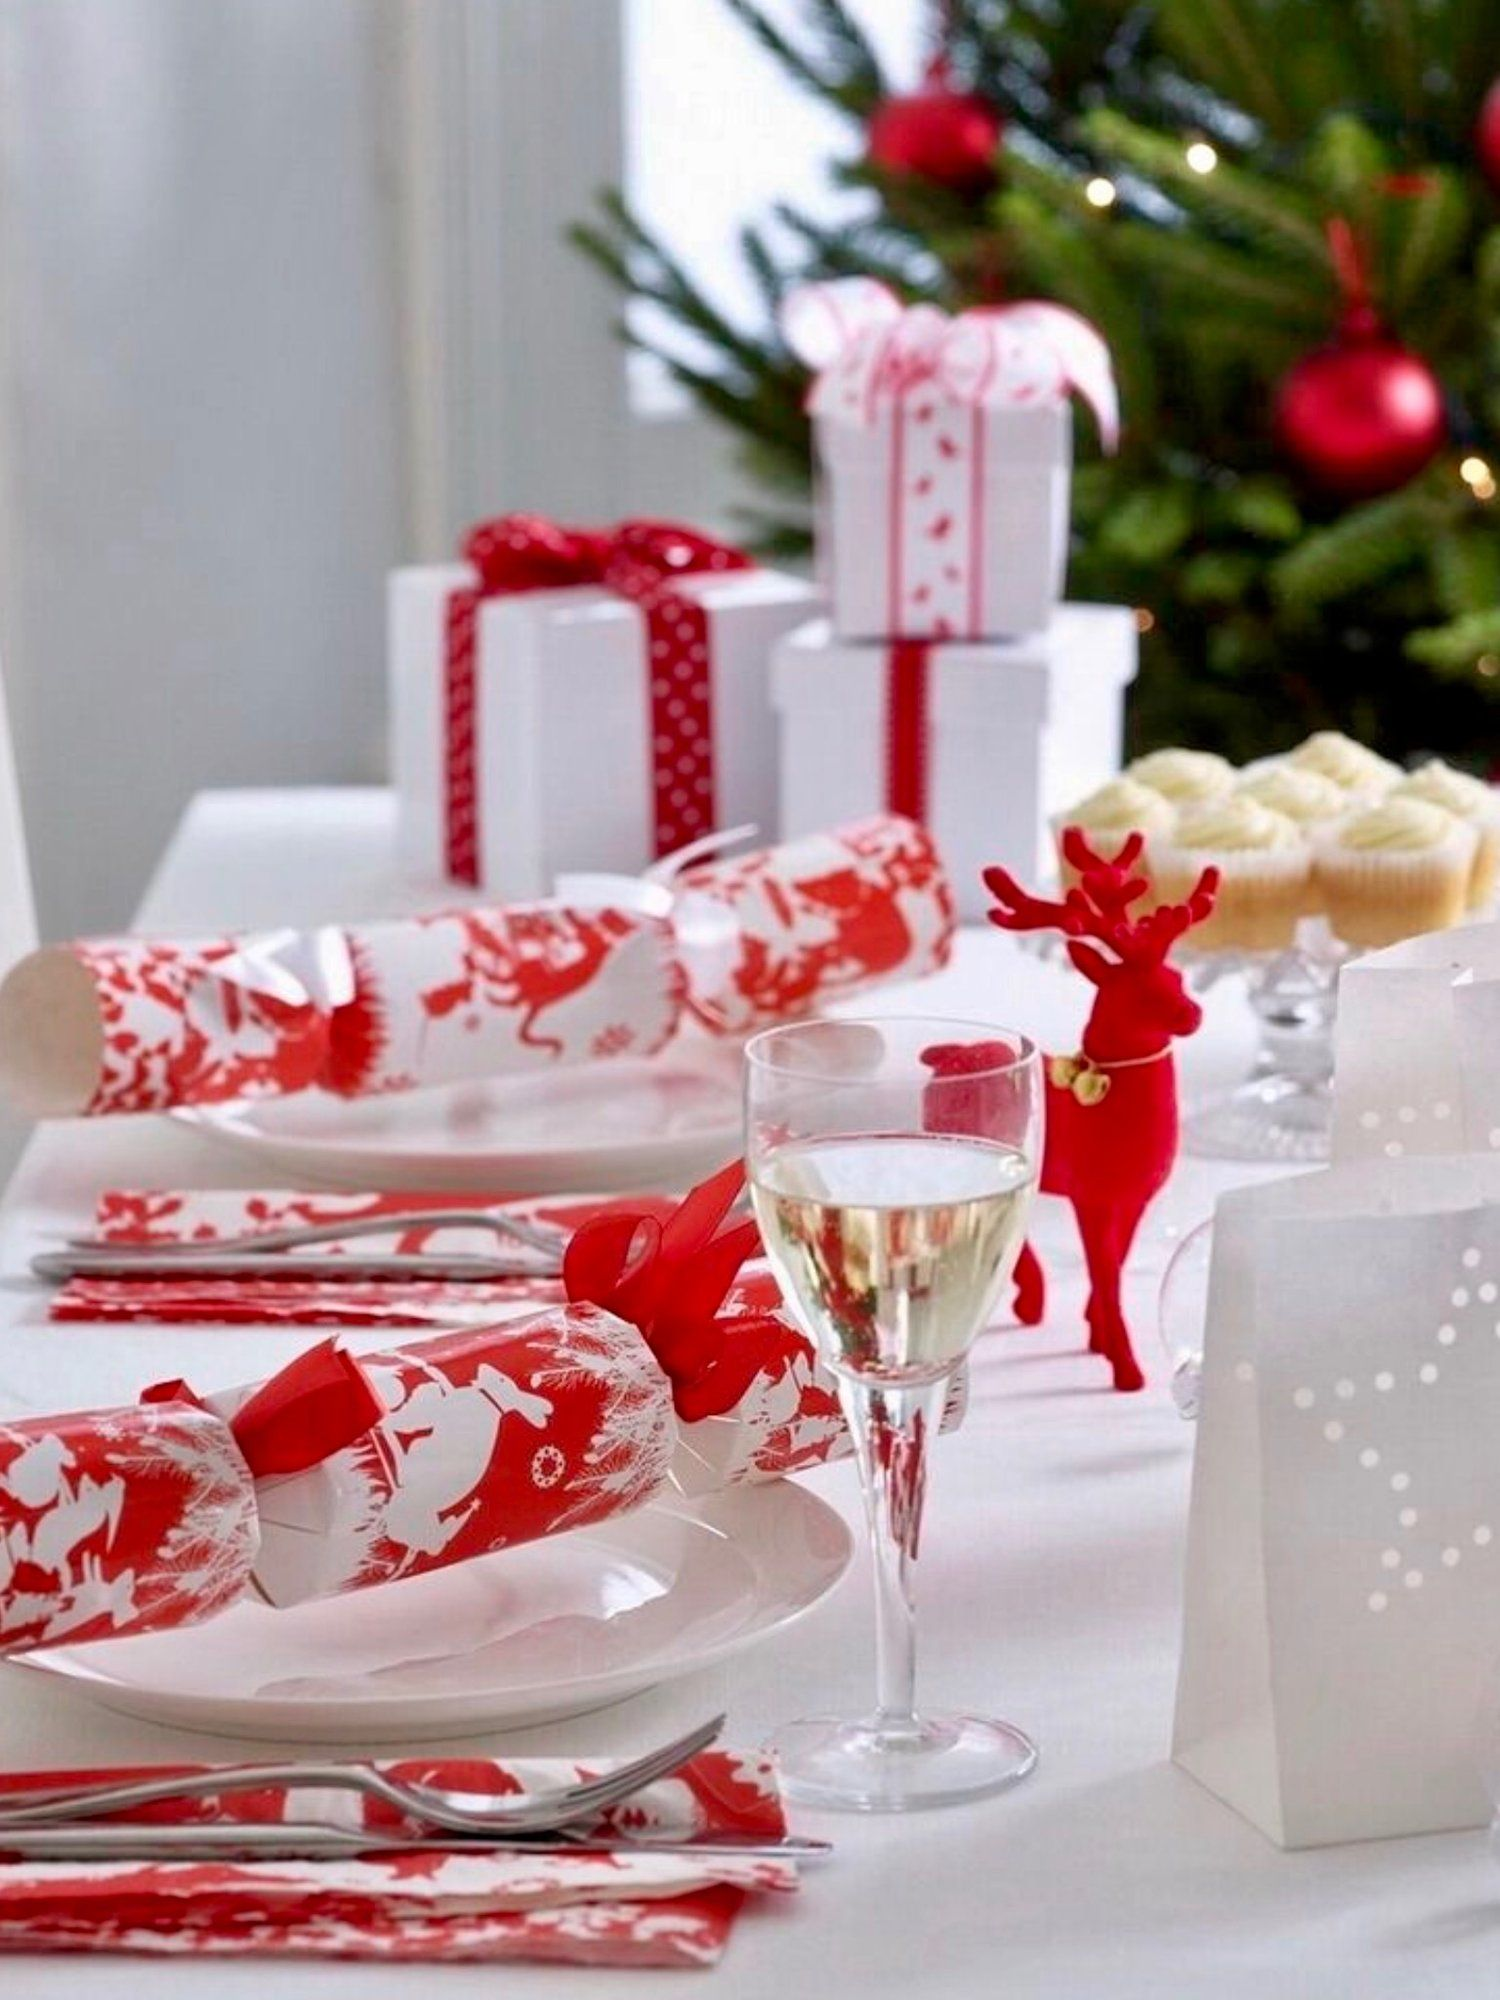 Top 150 Christmas Tables (2/5)🎄 | Christmas Table Decorations ...